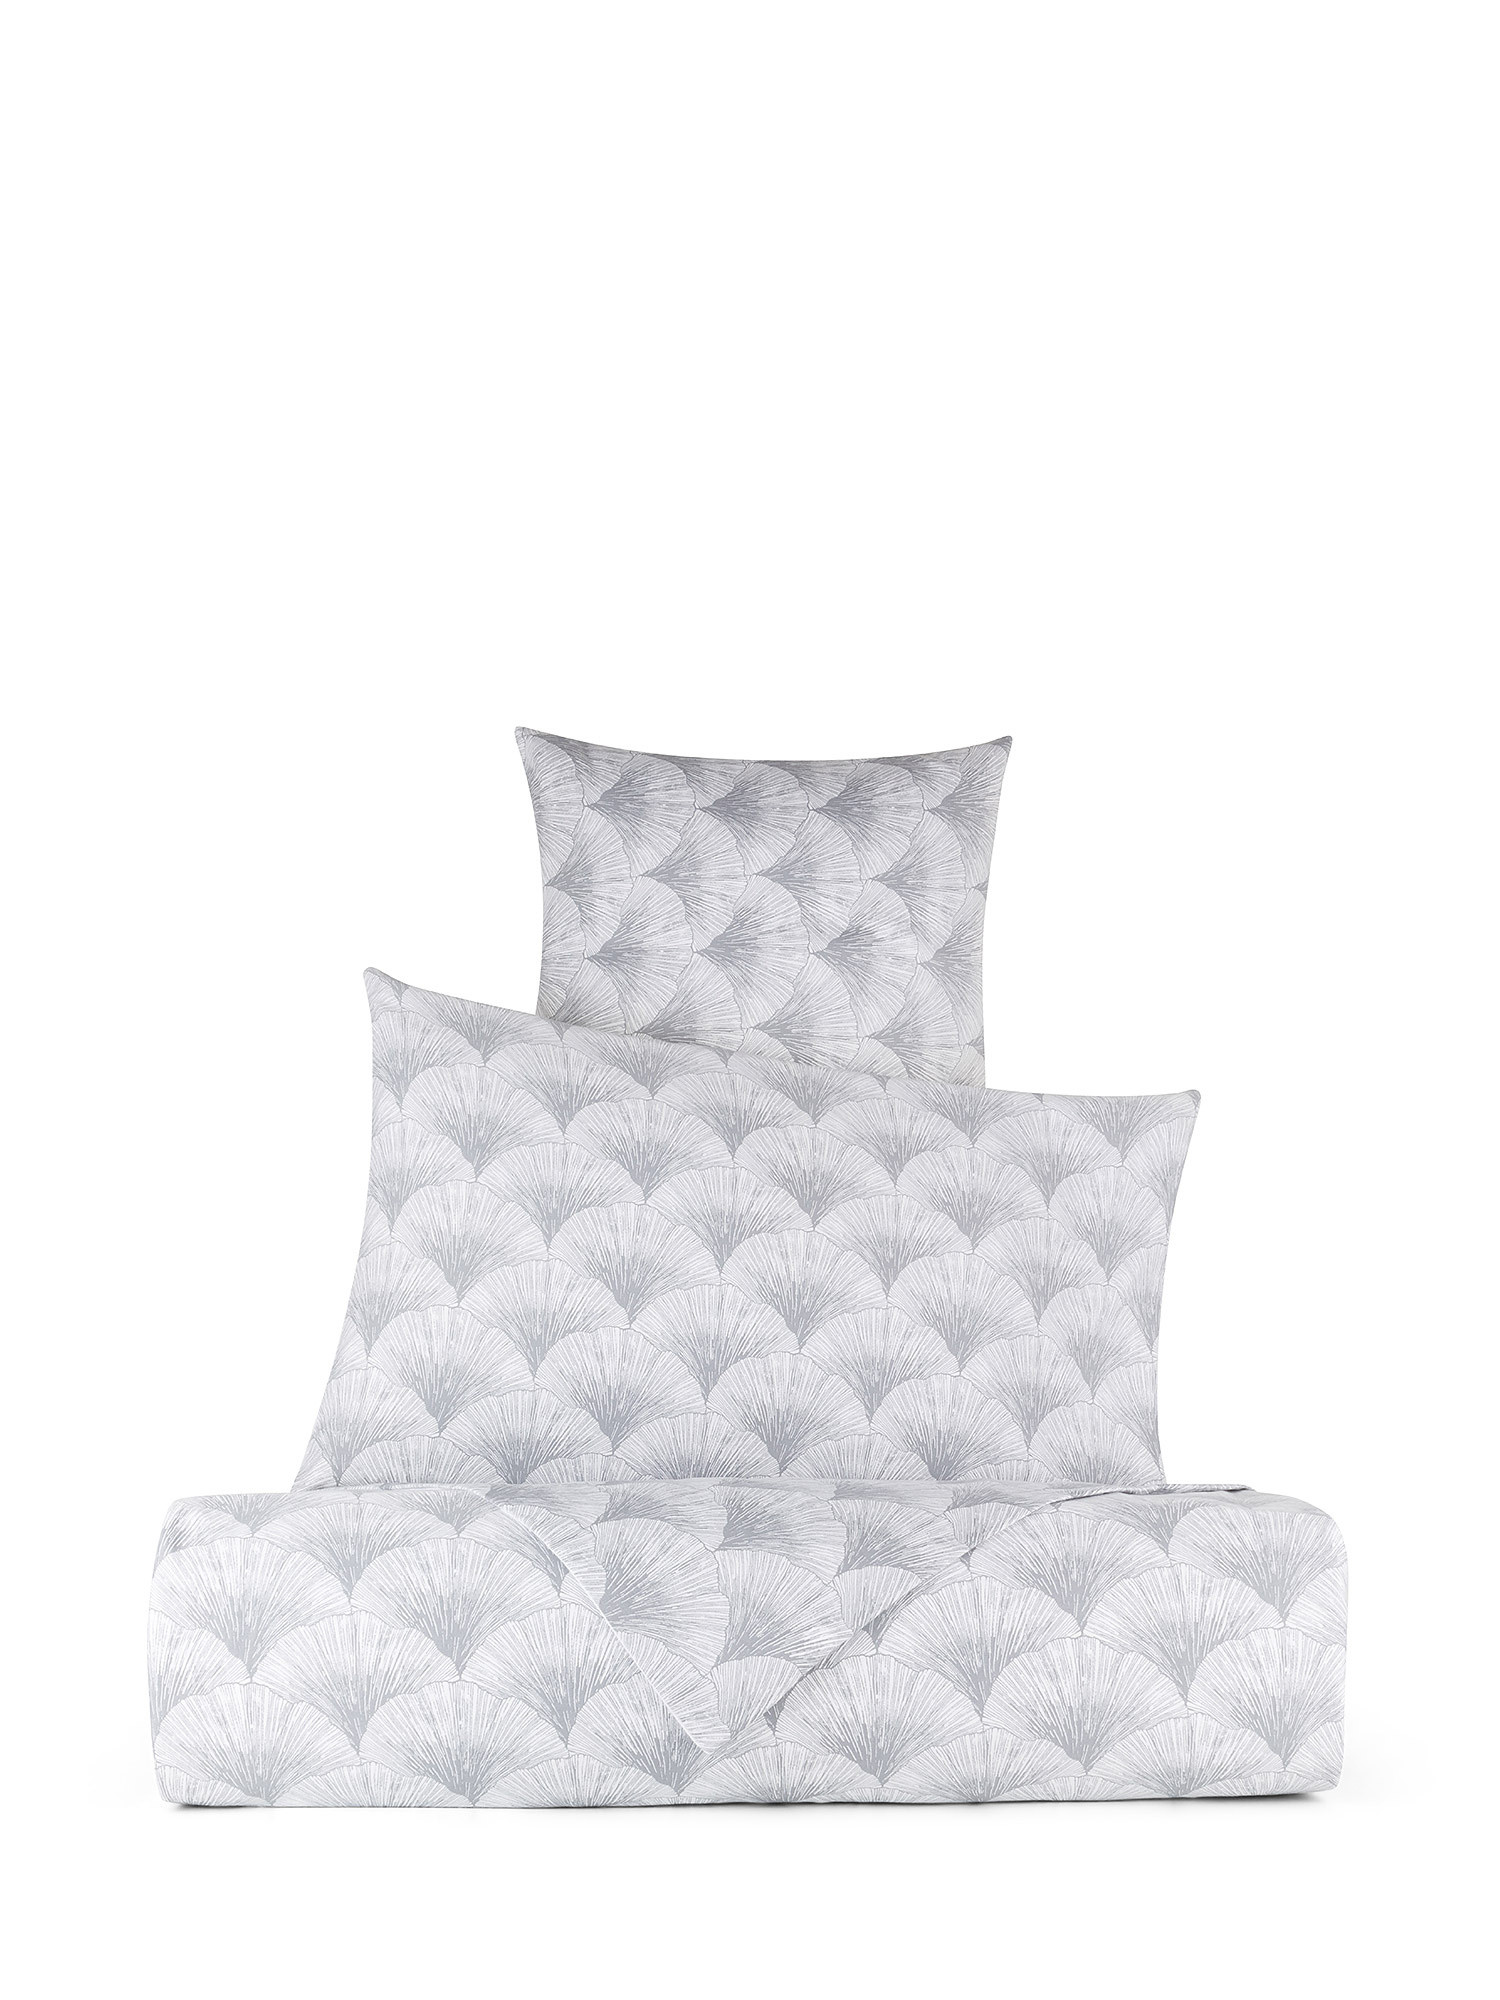 Federa raso di cotone fantasia Ginkgo, Bianco, large image number 2